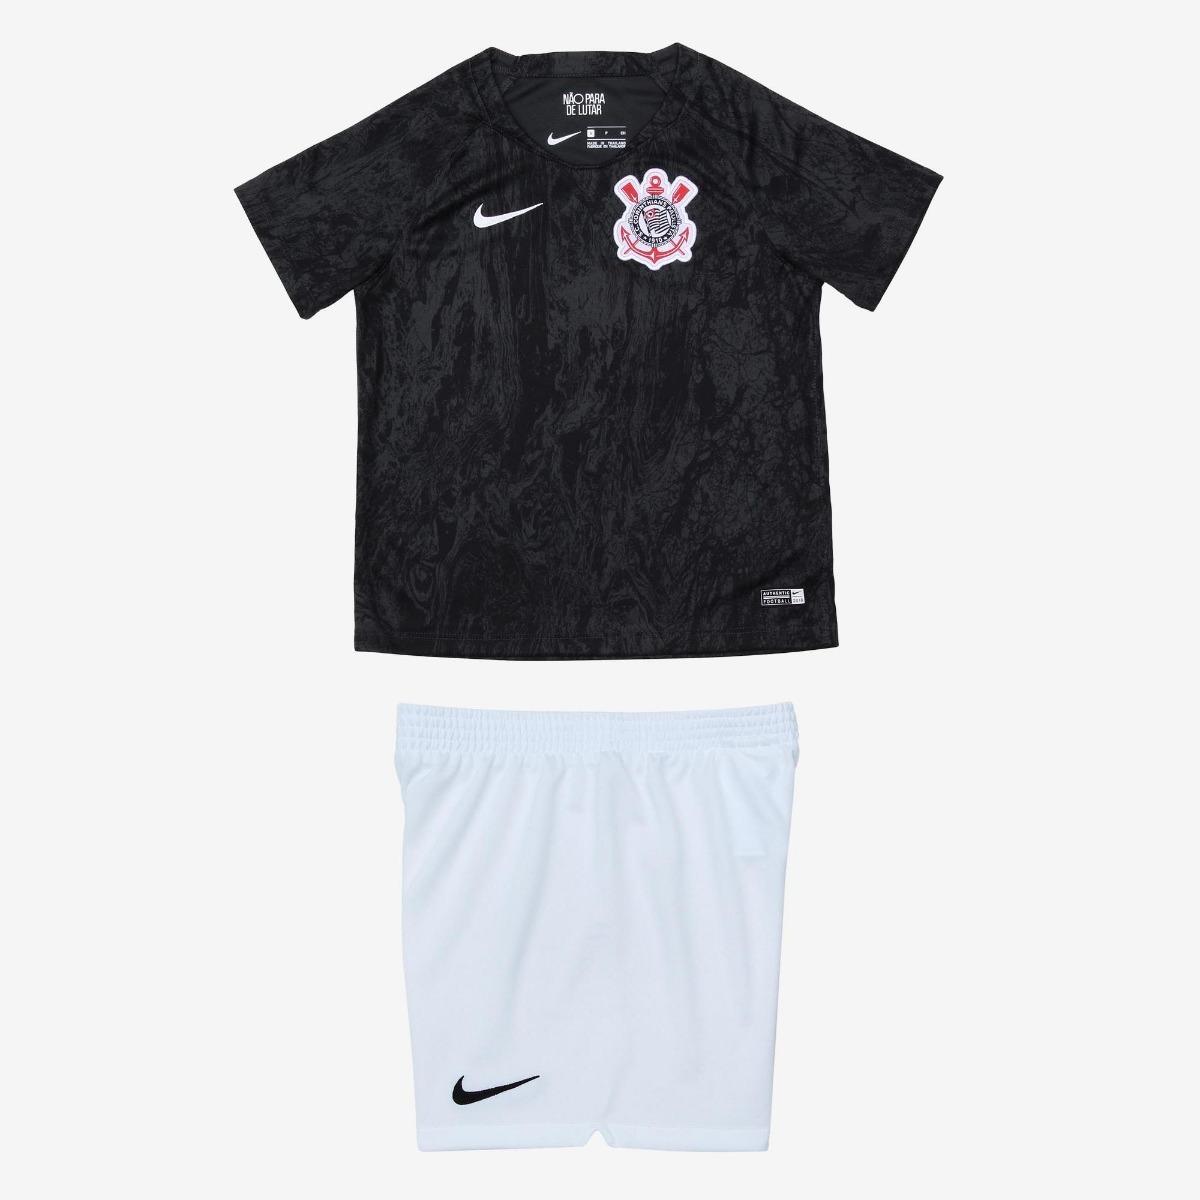 0eebd8846abd4 Uniforme Infantil Camisa E Shorts Time Futebol Corinthians - R  149 ...